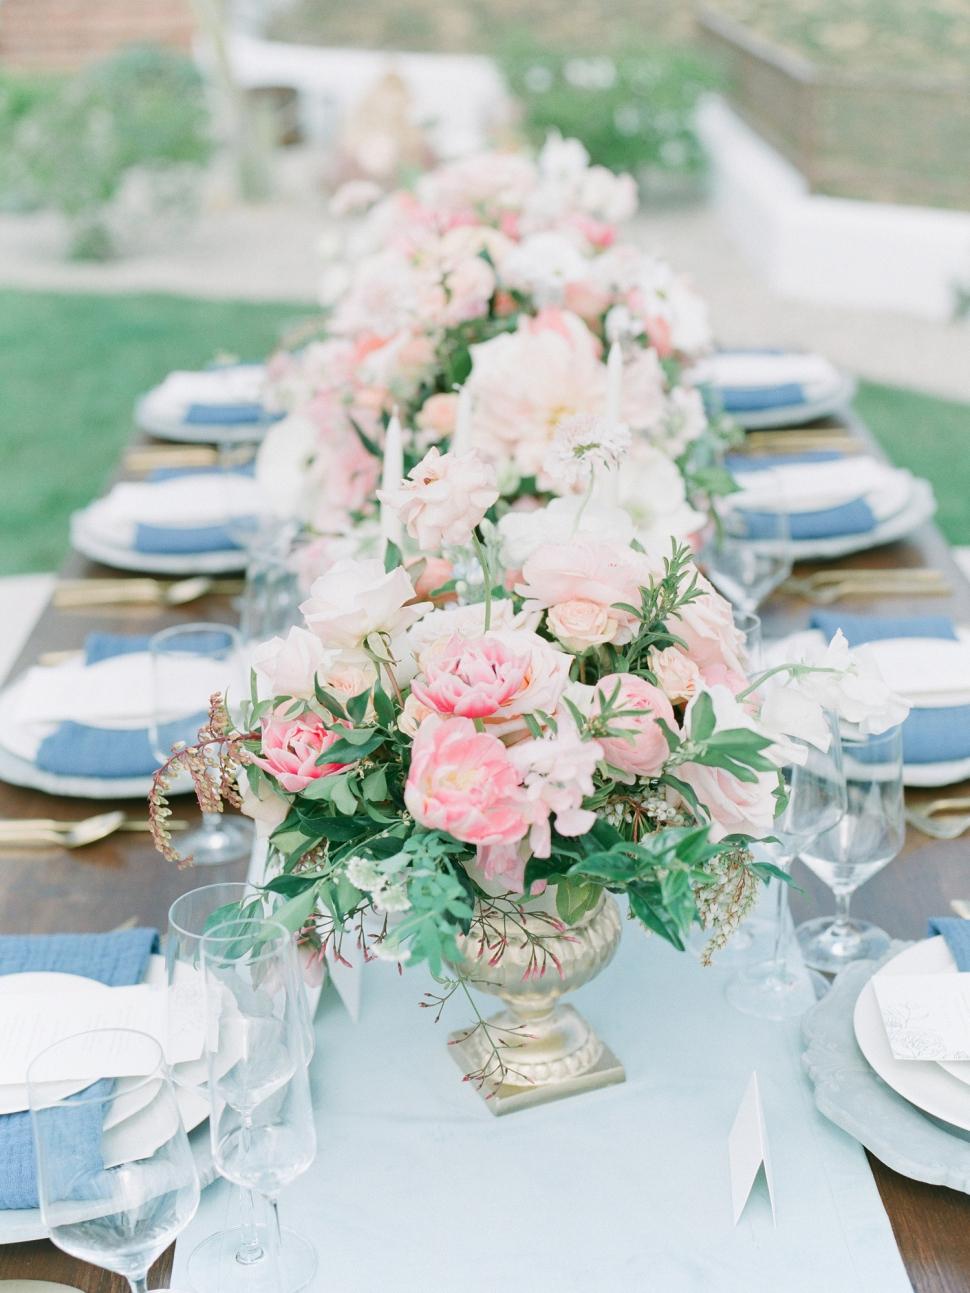 Southern-California-Malibu-Wedding-Photographer-Cassi-Claire-Deer-Creek-Ridge-Wedding_12.jpg